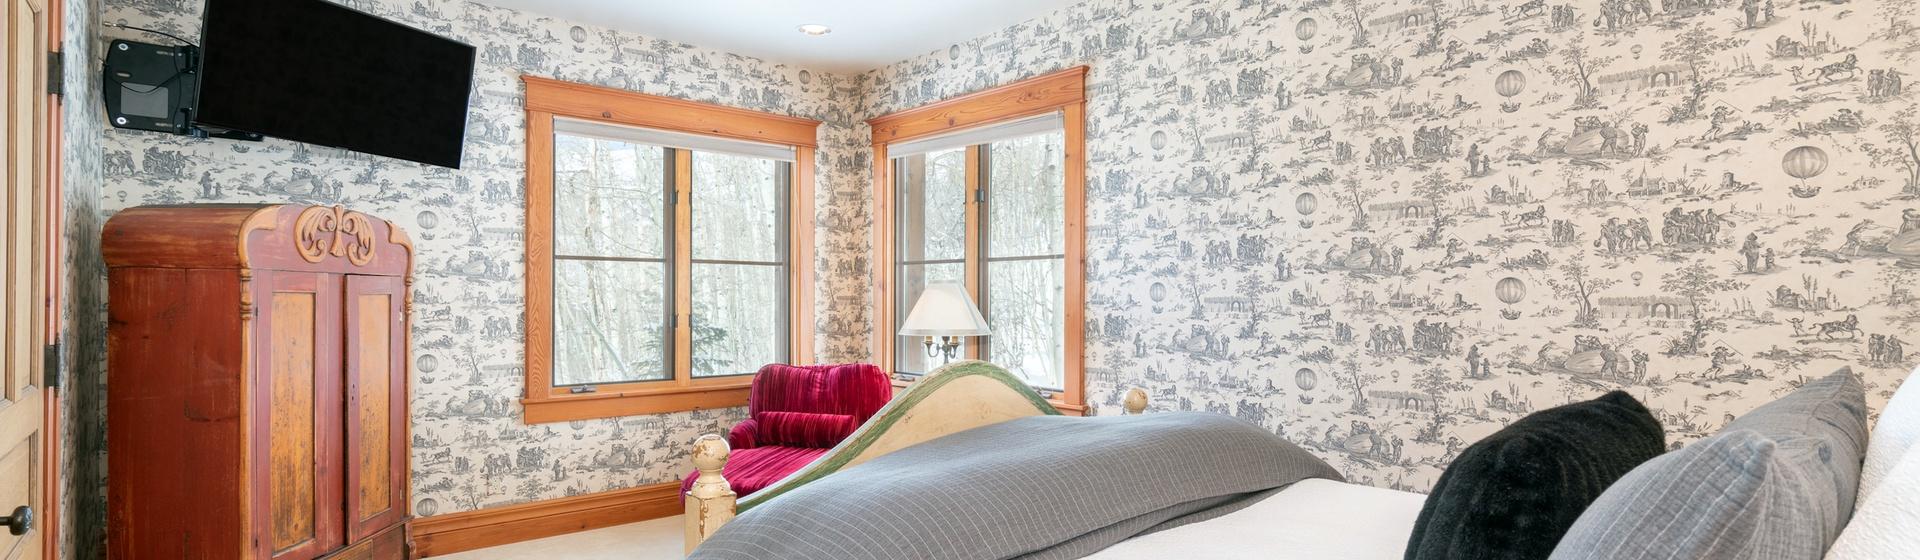 29-MountainVillage-Positive-Outlook-Queen-Master-Bedroom-Web.jpg